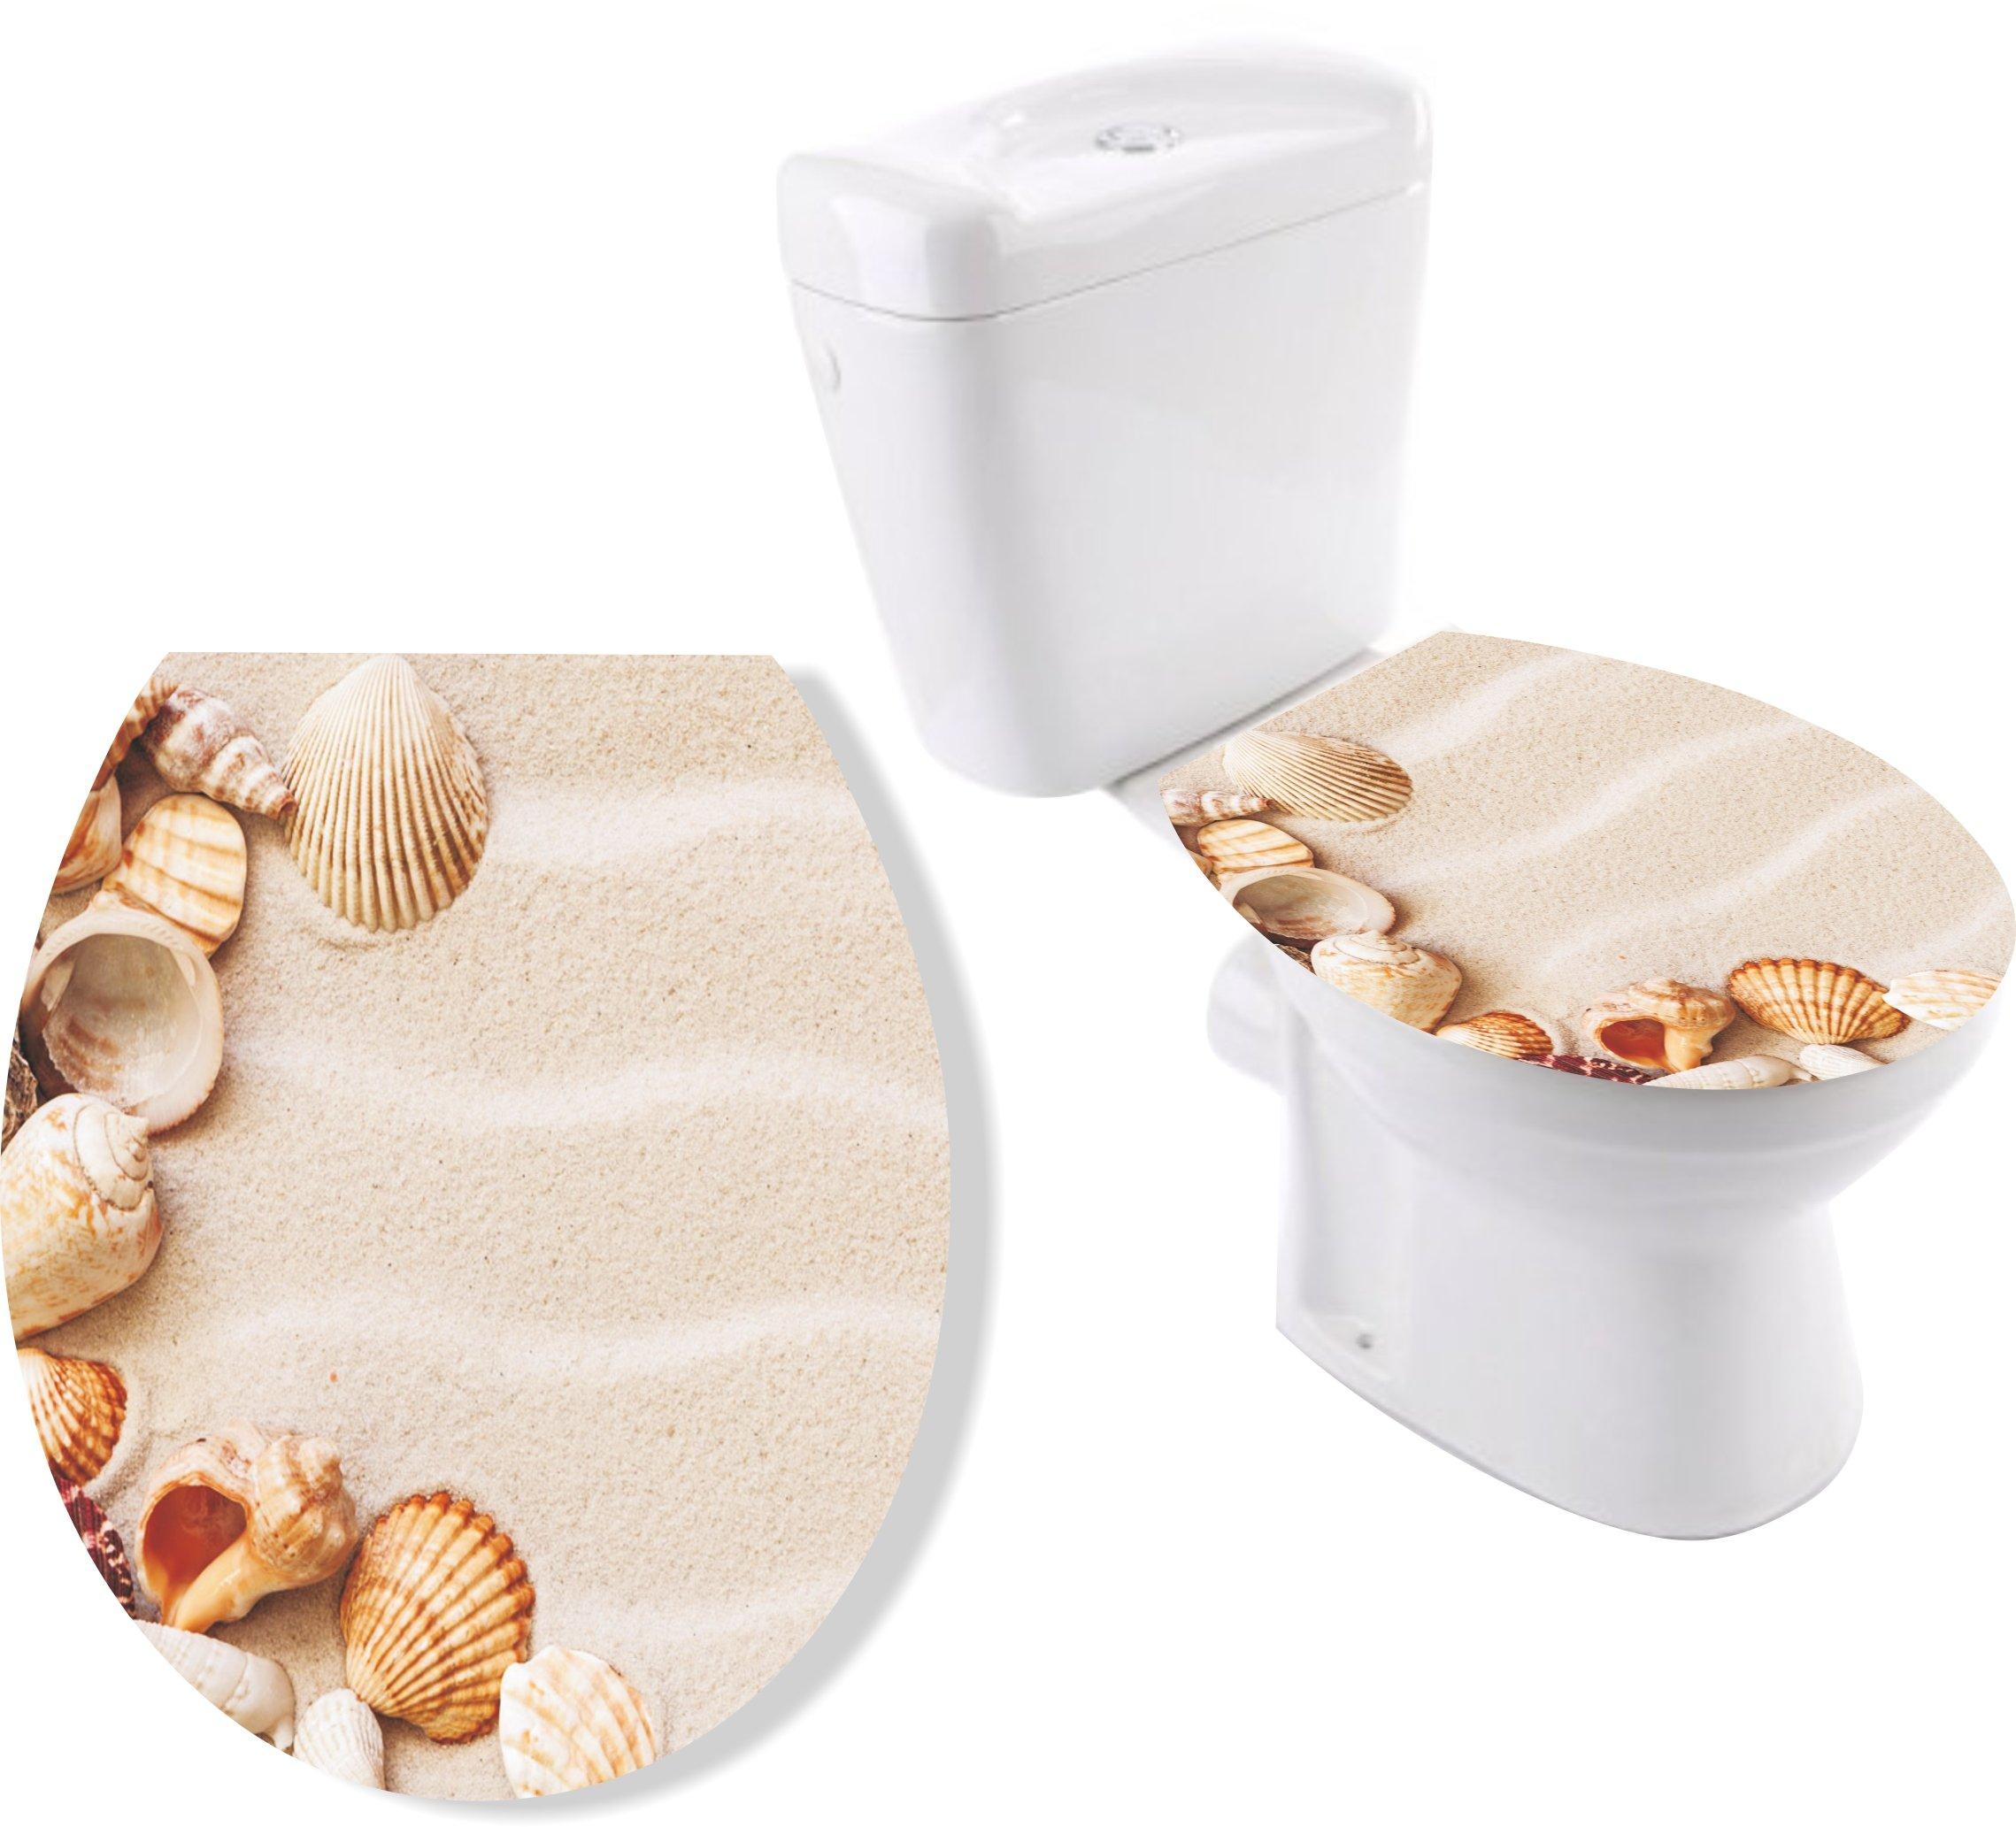 Nálepka na toaletnú nálepku ToC toalety